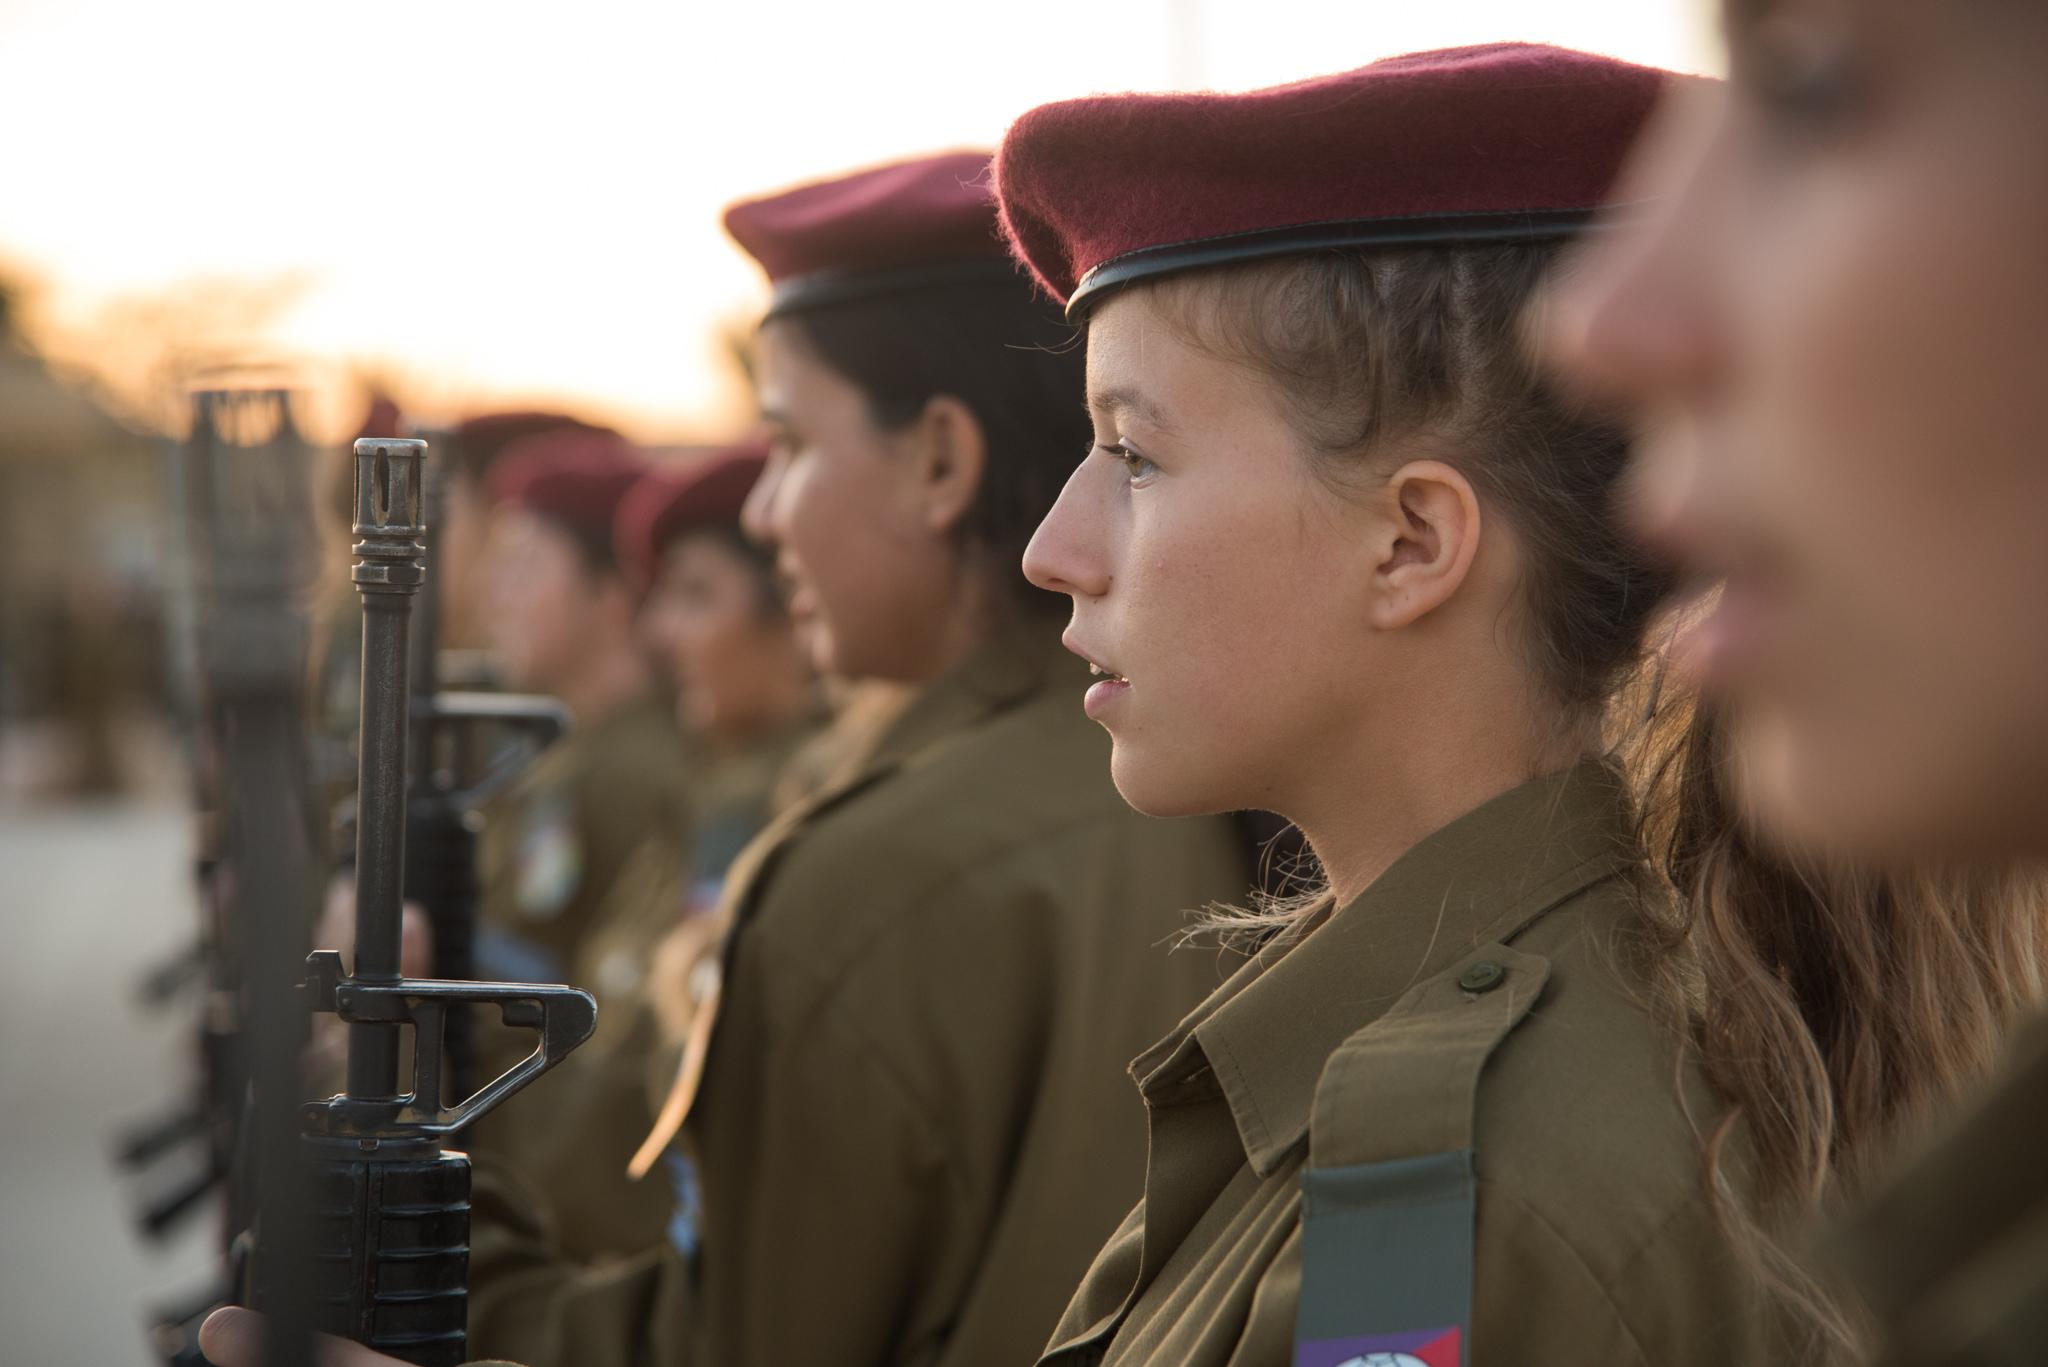 Женская армия. ( 55 фото ) 39728536972_54b501093c_k.jpg